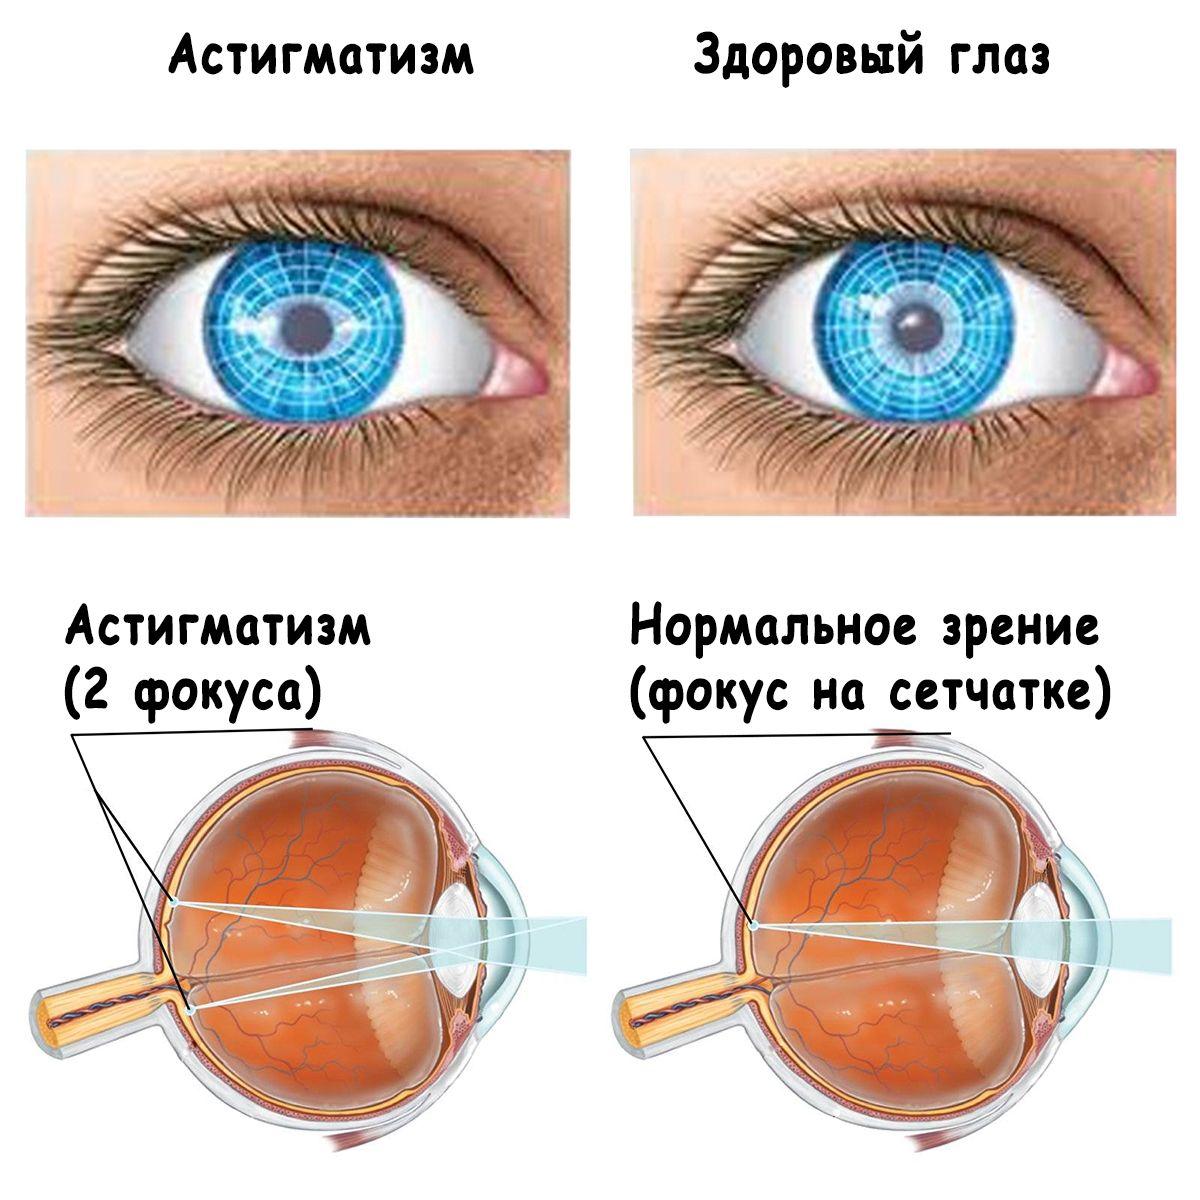 Гиперметропический астигматизм левого глаза